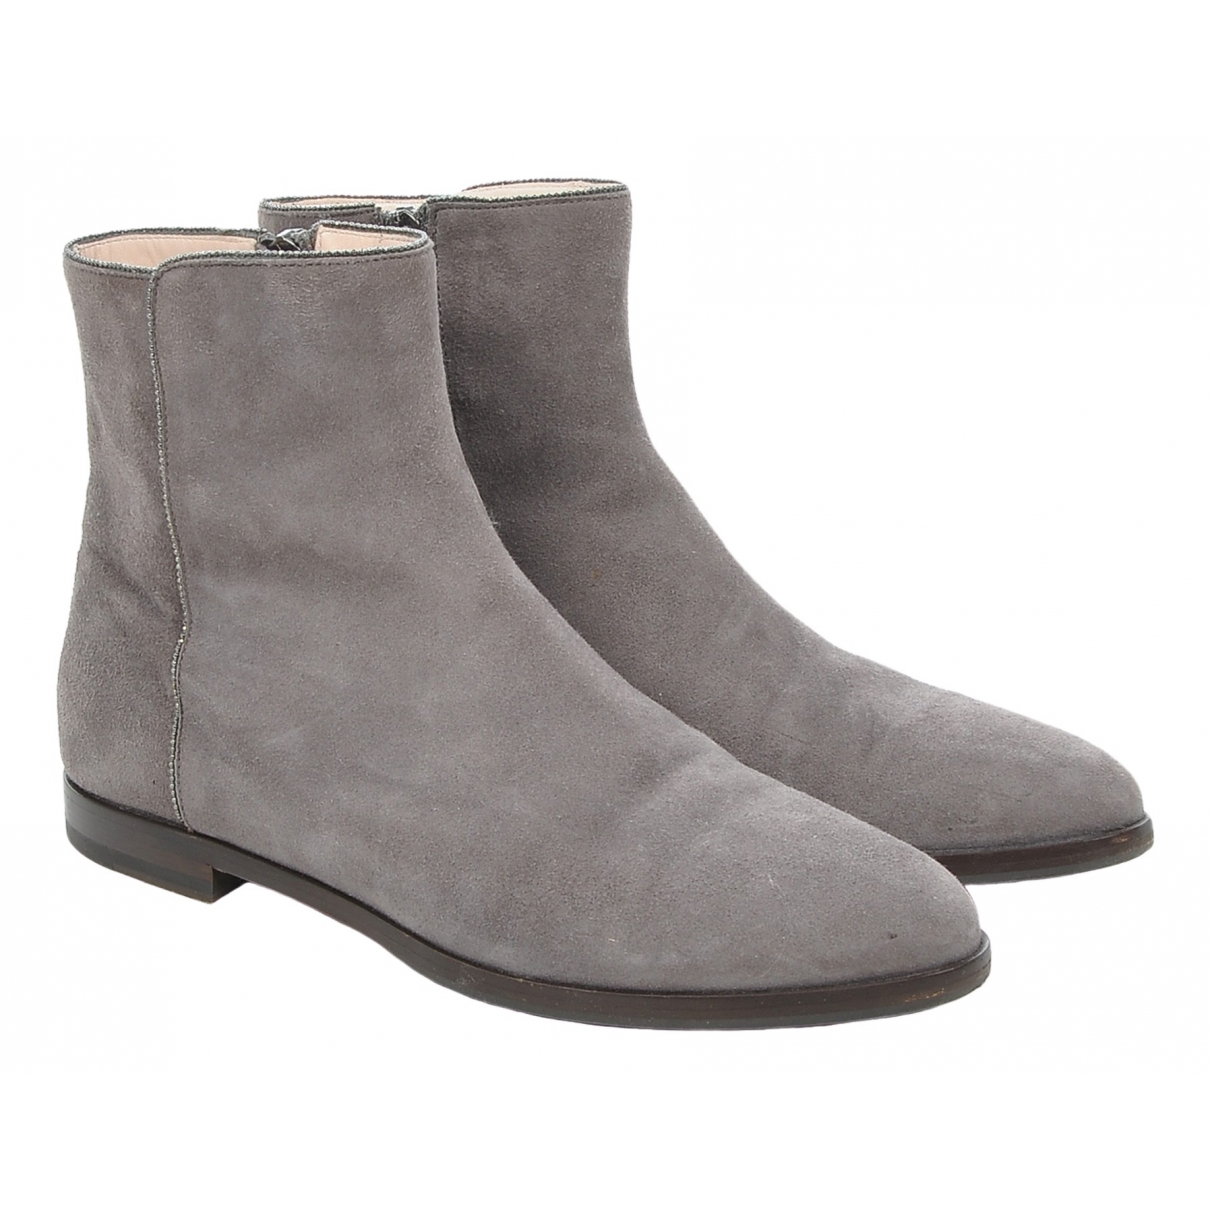 Fabiana Filippi \N Grey Suede Ankle boots for Women 37 EU